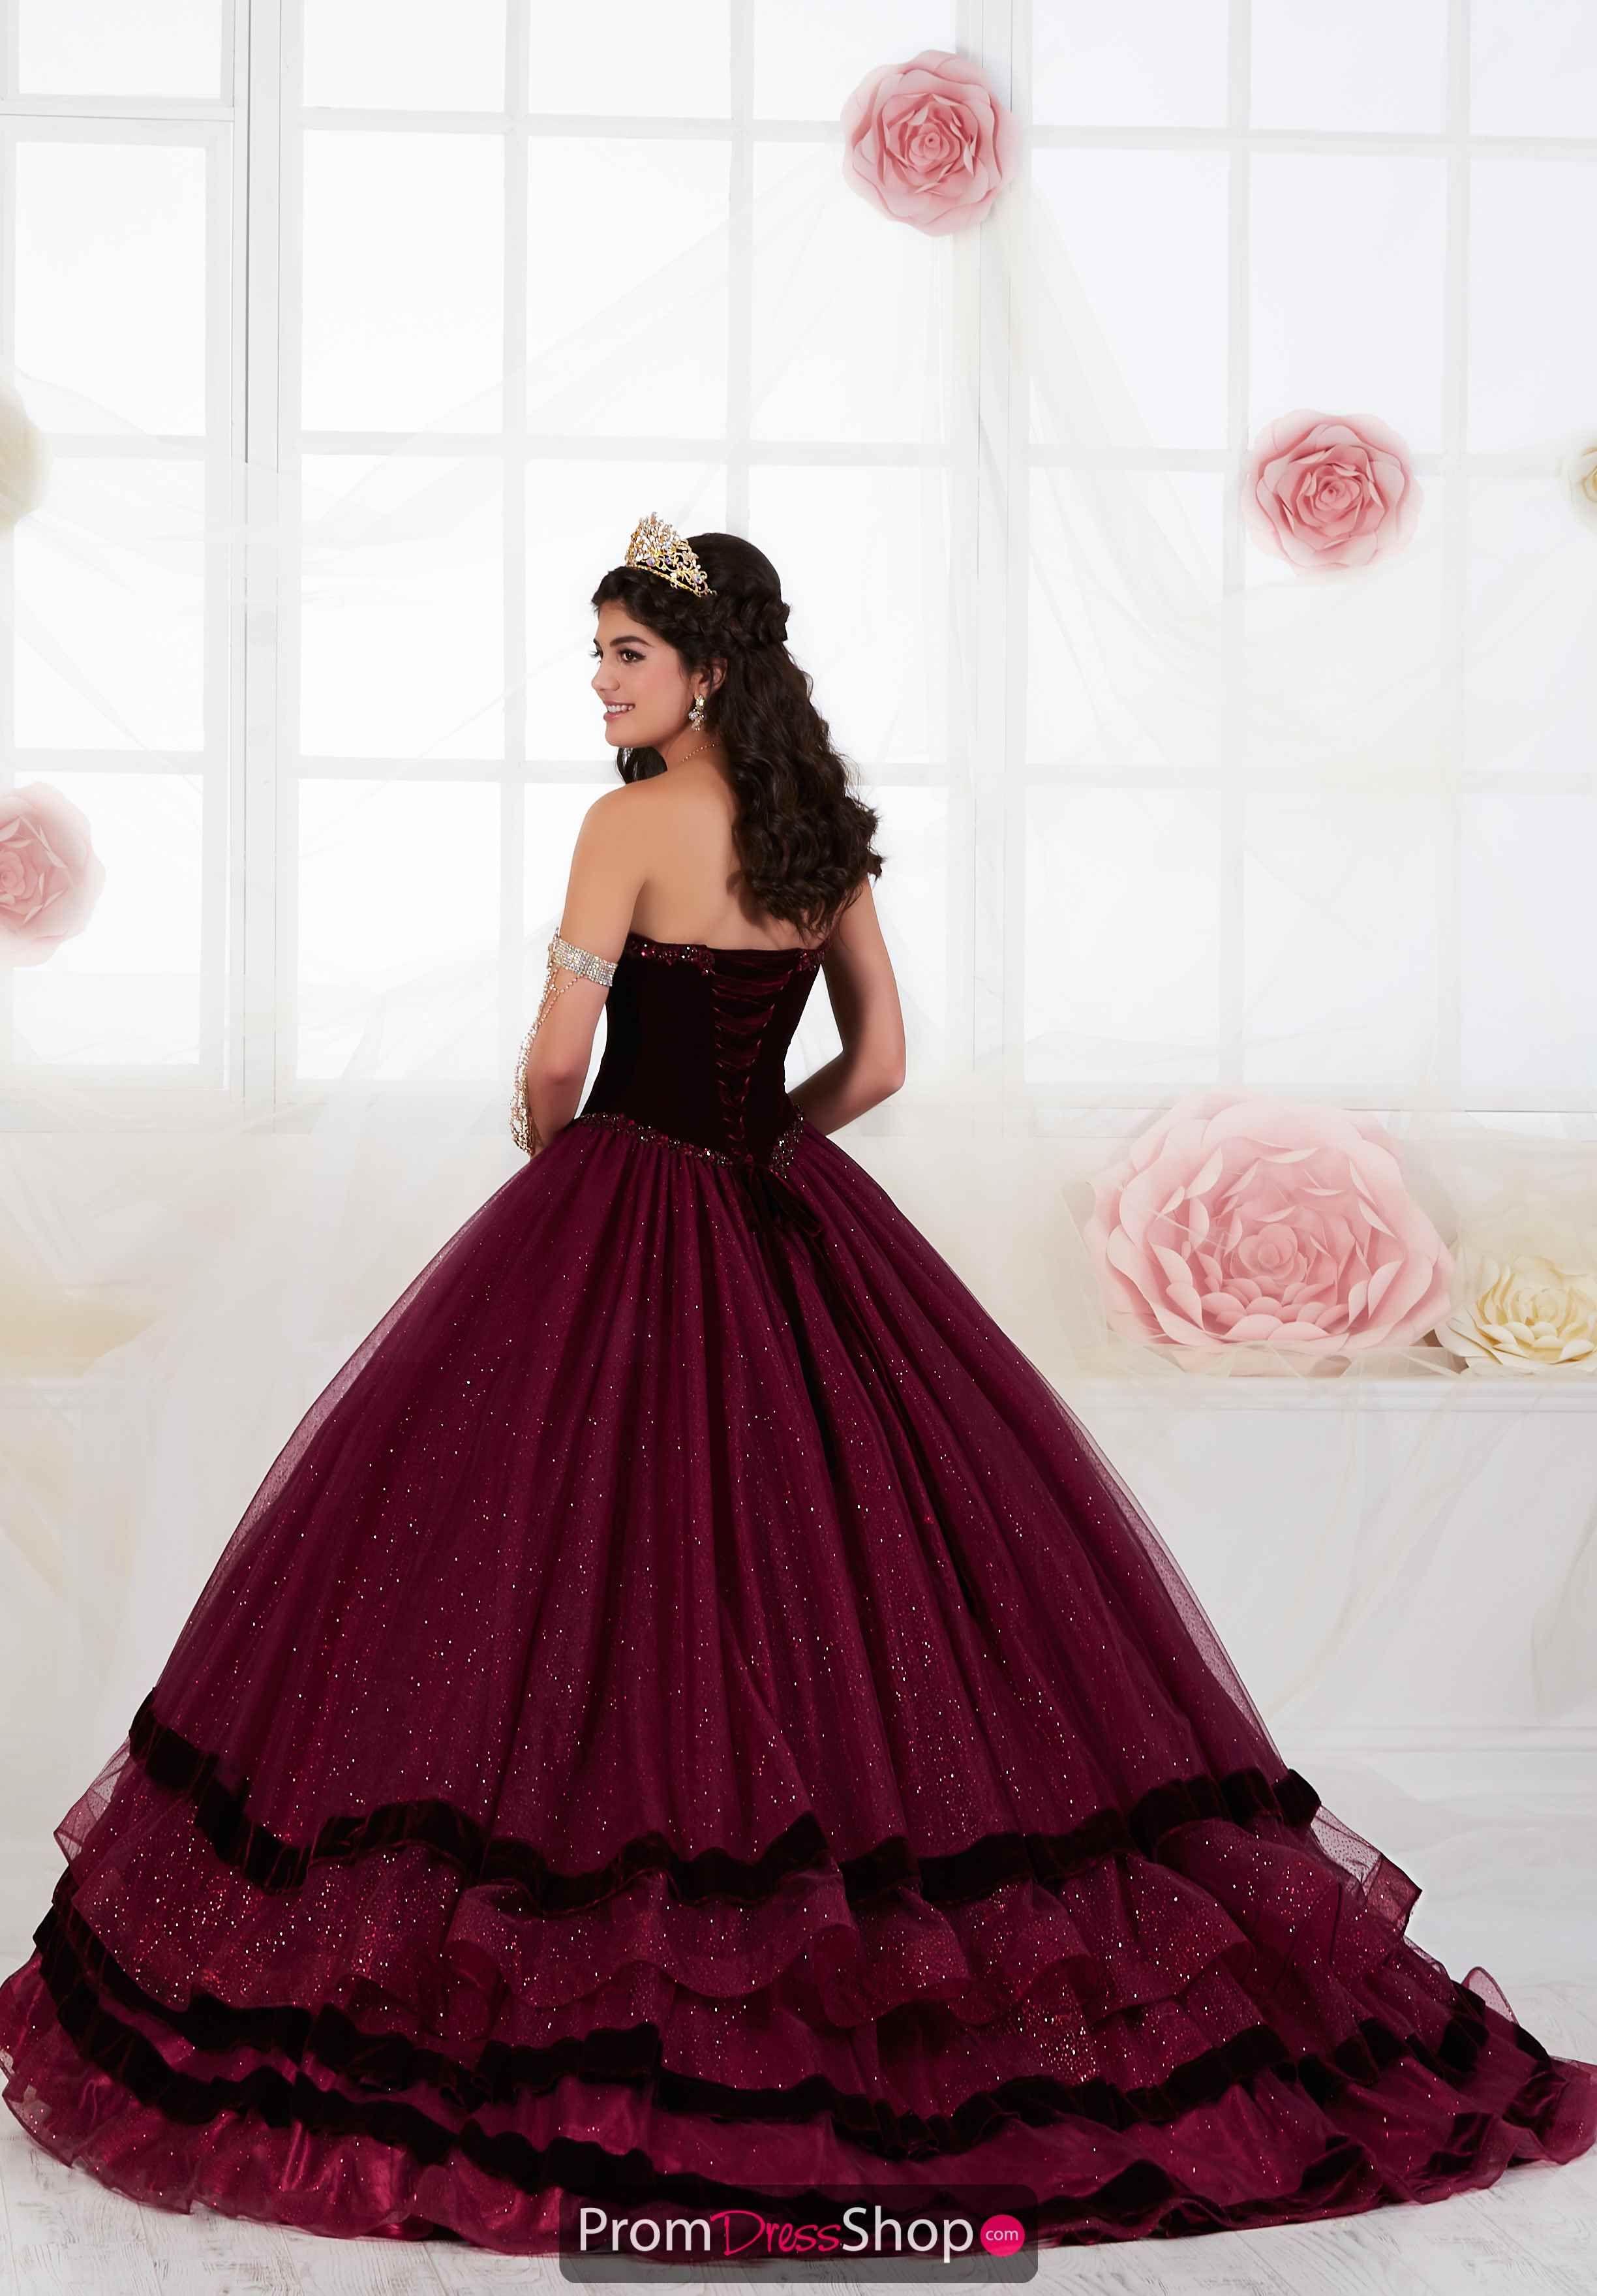 58b7eb4c Wine Strapless Sweetheart Neckline, Quinceanera Dresses, Marsala, Mauve,  Ball Gowns, Burgundy